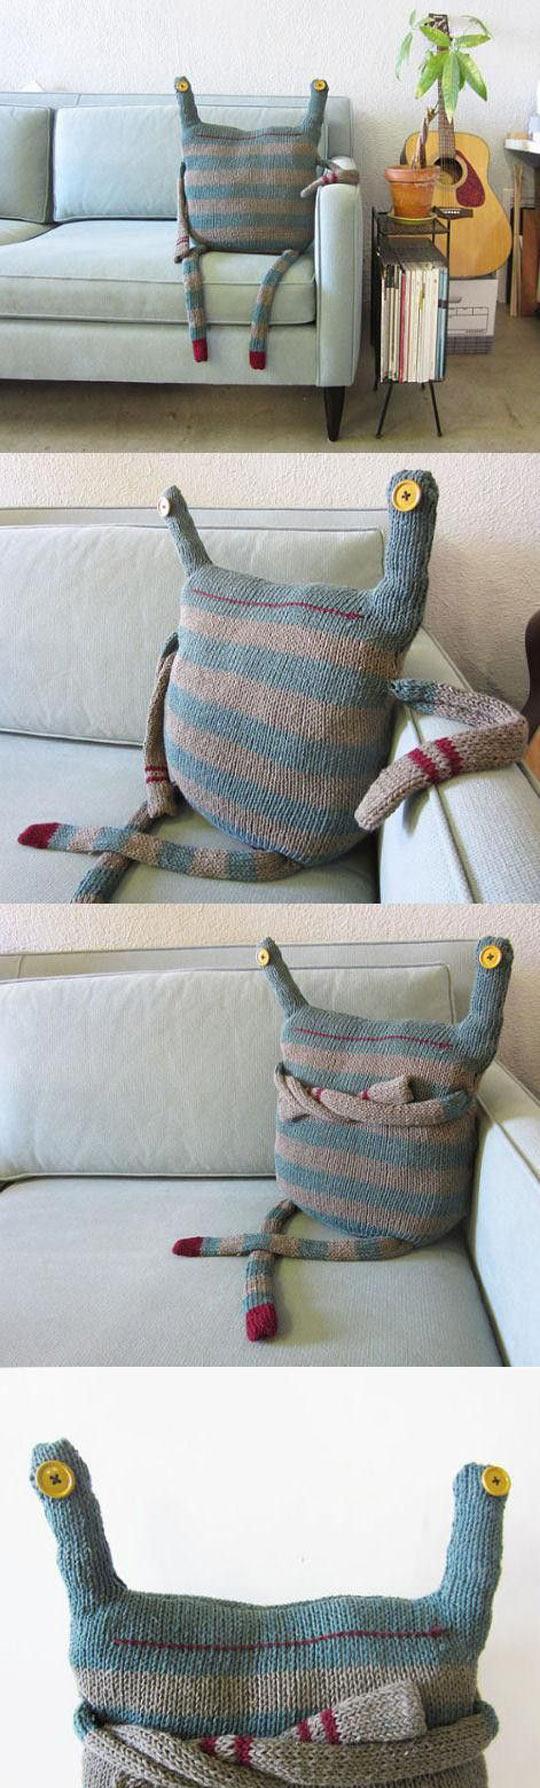 funny-monster-sofa-homemade-cool